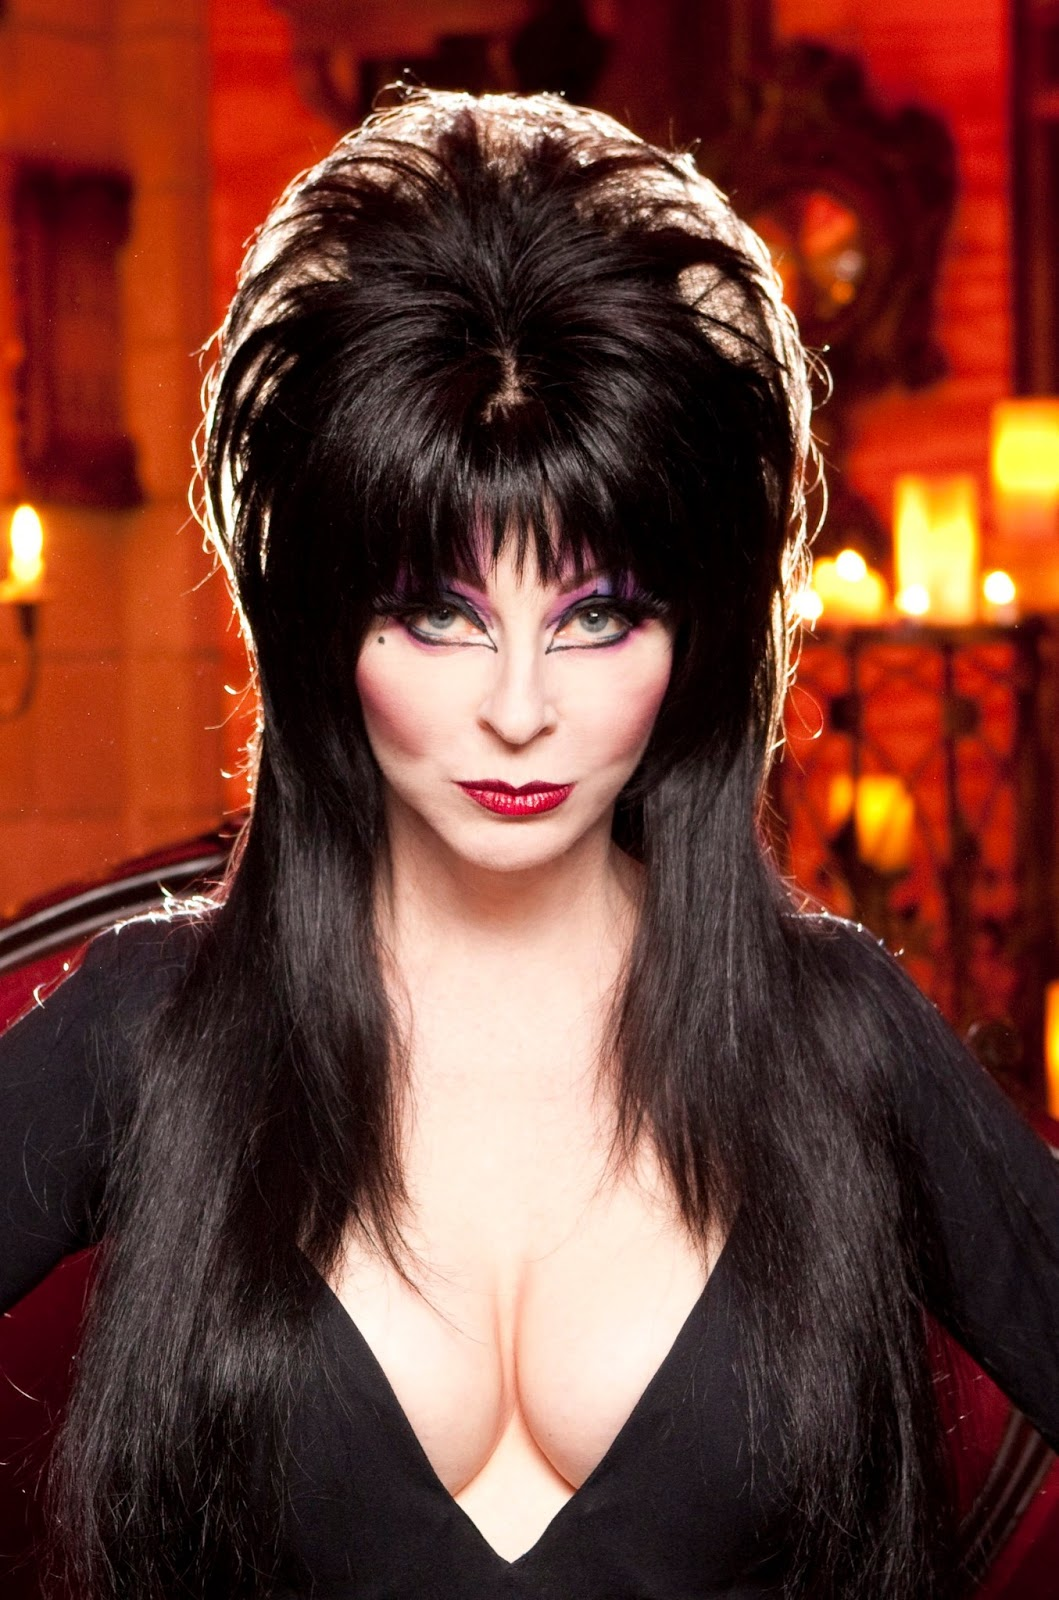 Elvira mistress of the dark seems me